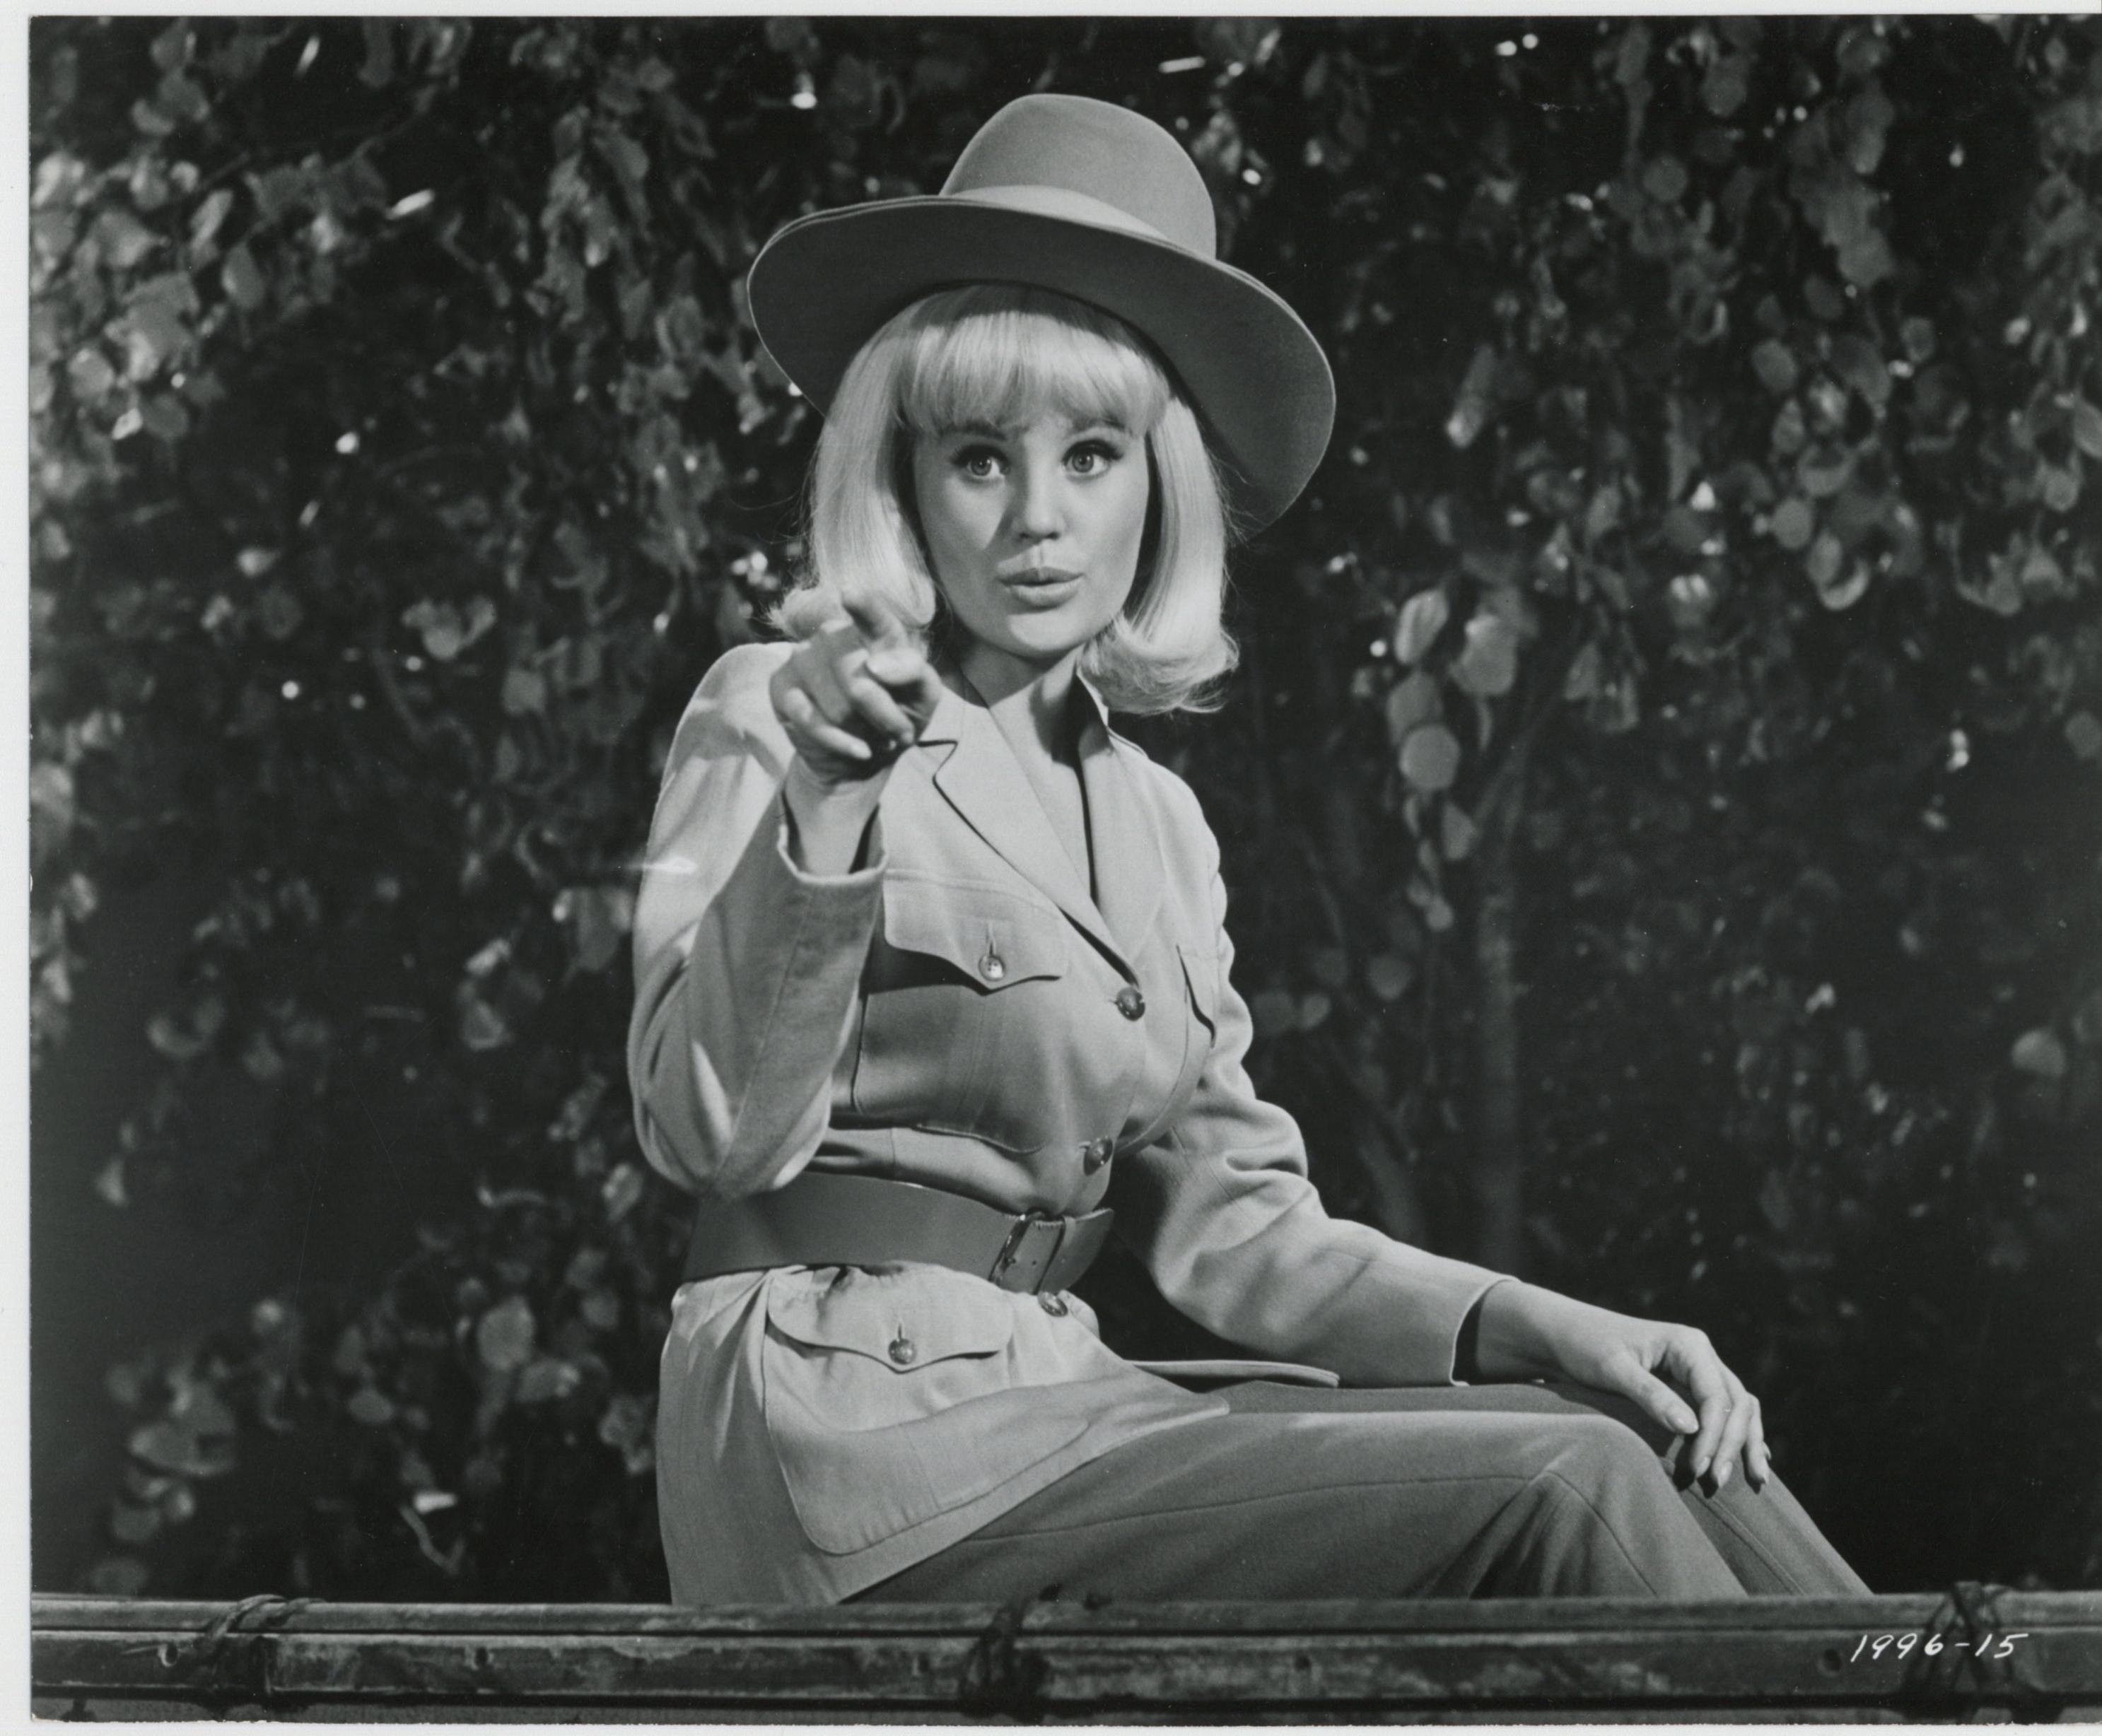 Pamela Austin in The Perils of Pauline (1967)